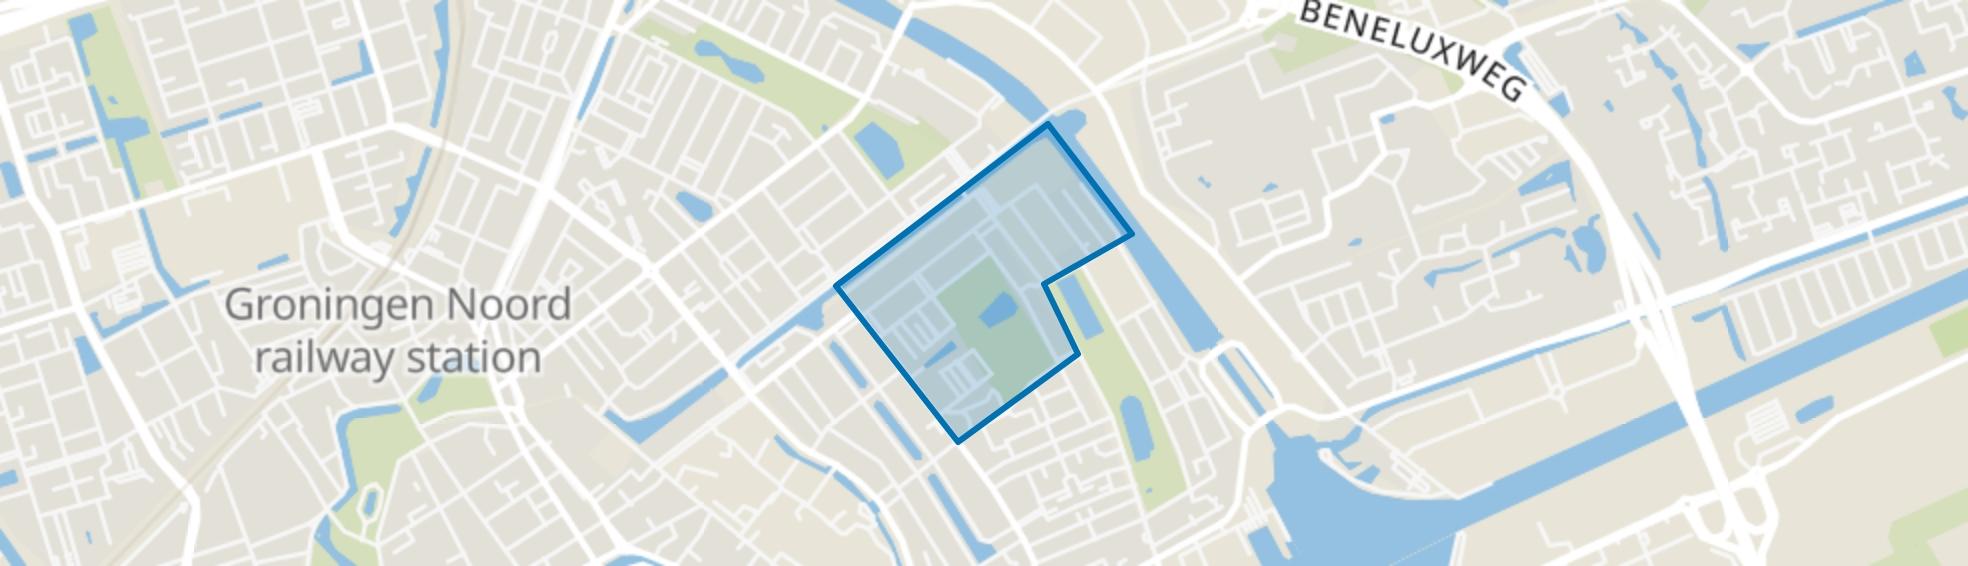 Vogelbuurt, Groningen map